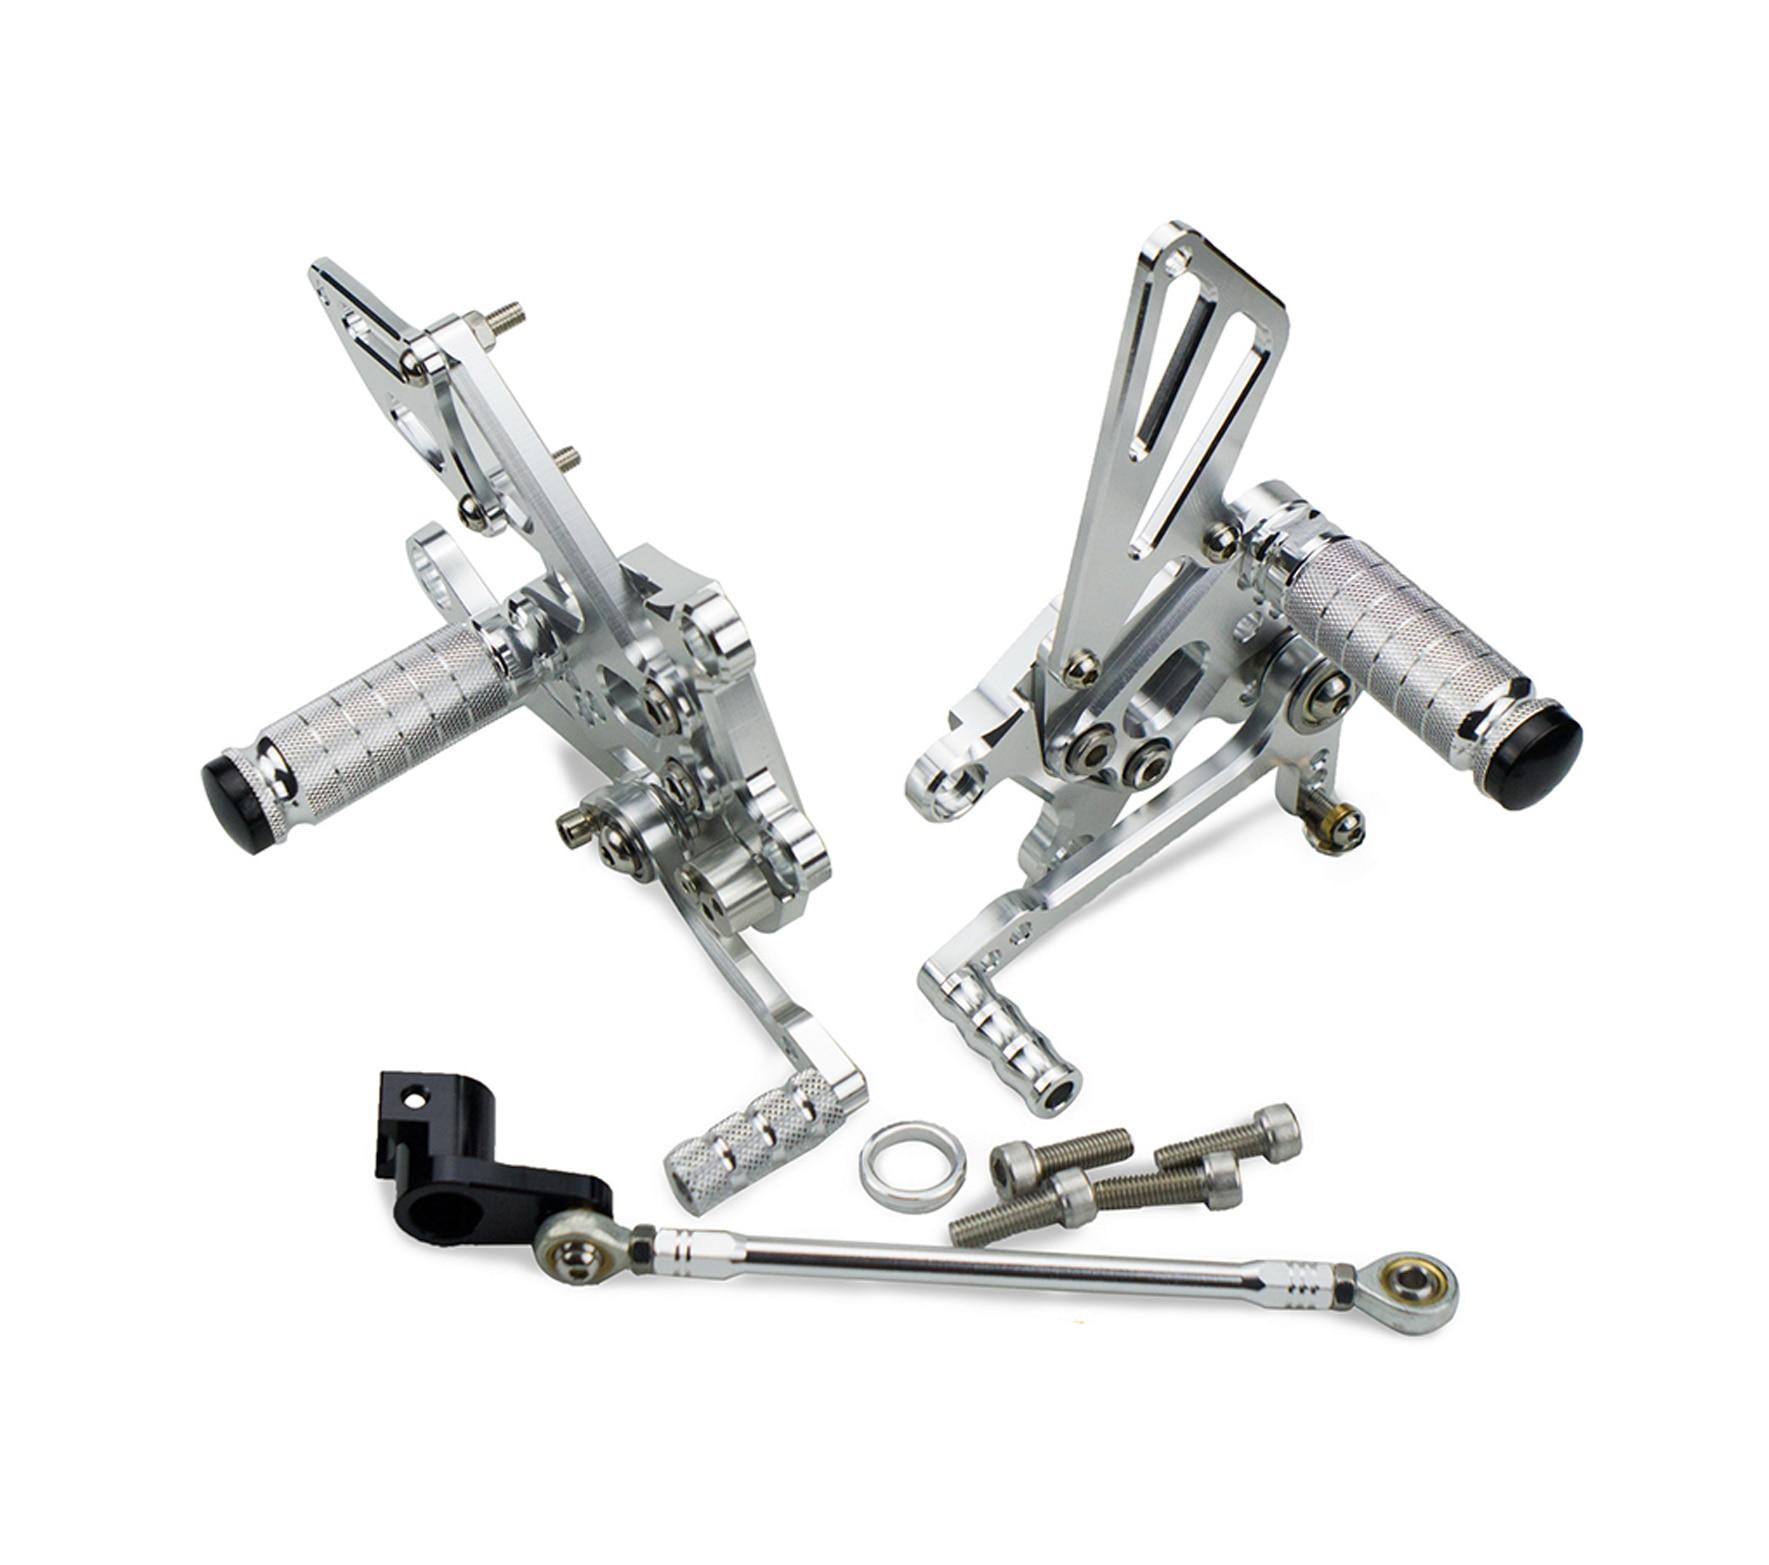 CNC  Adjustable Rear Sets Footpeg Foot Pegs Footrest For Aprilia RSV4 Factory 2009 2010 2011 2012 2013 2014 2015 2016